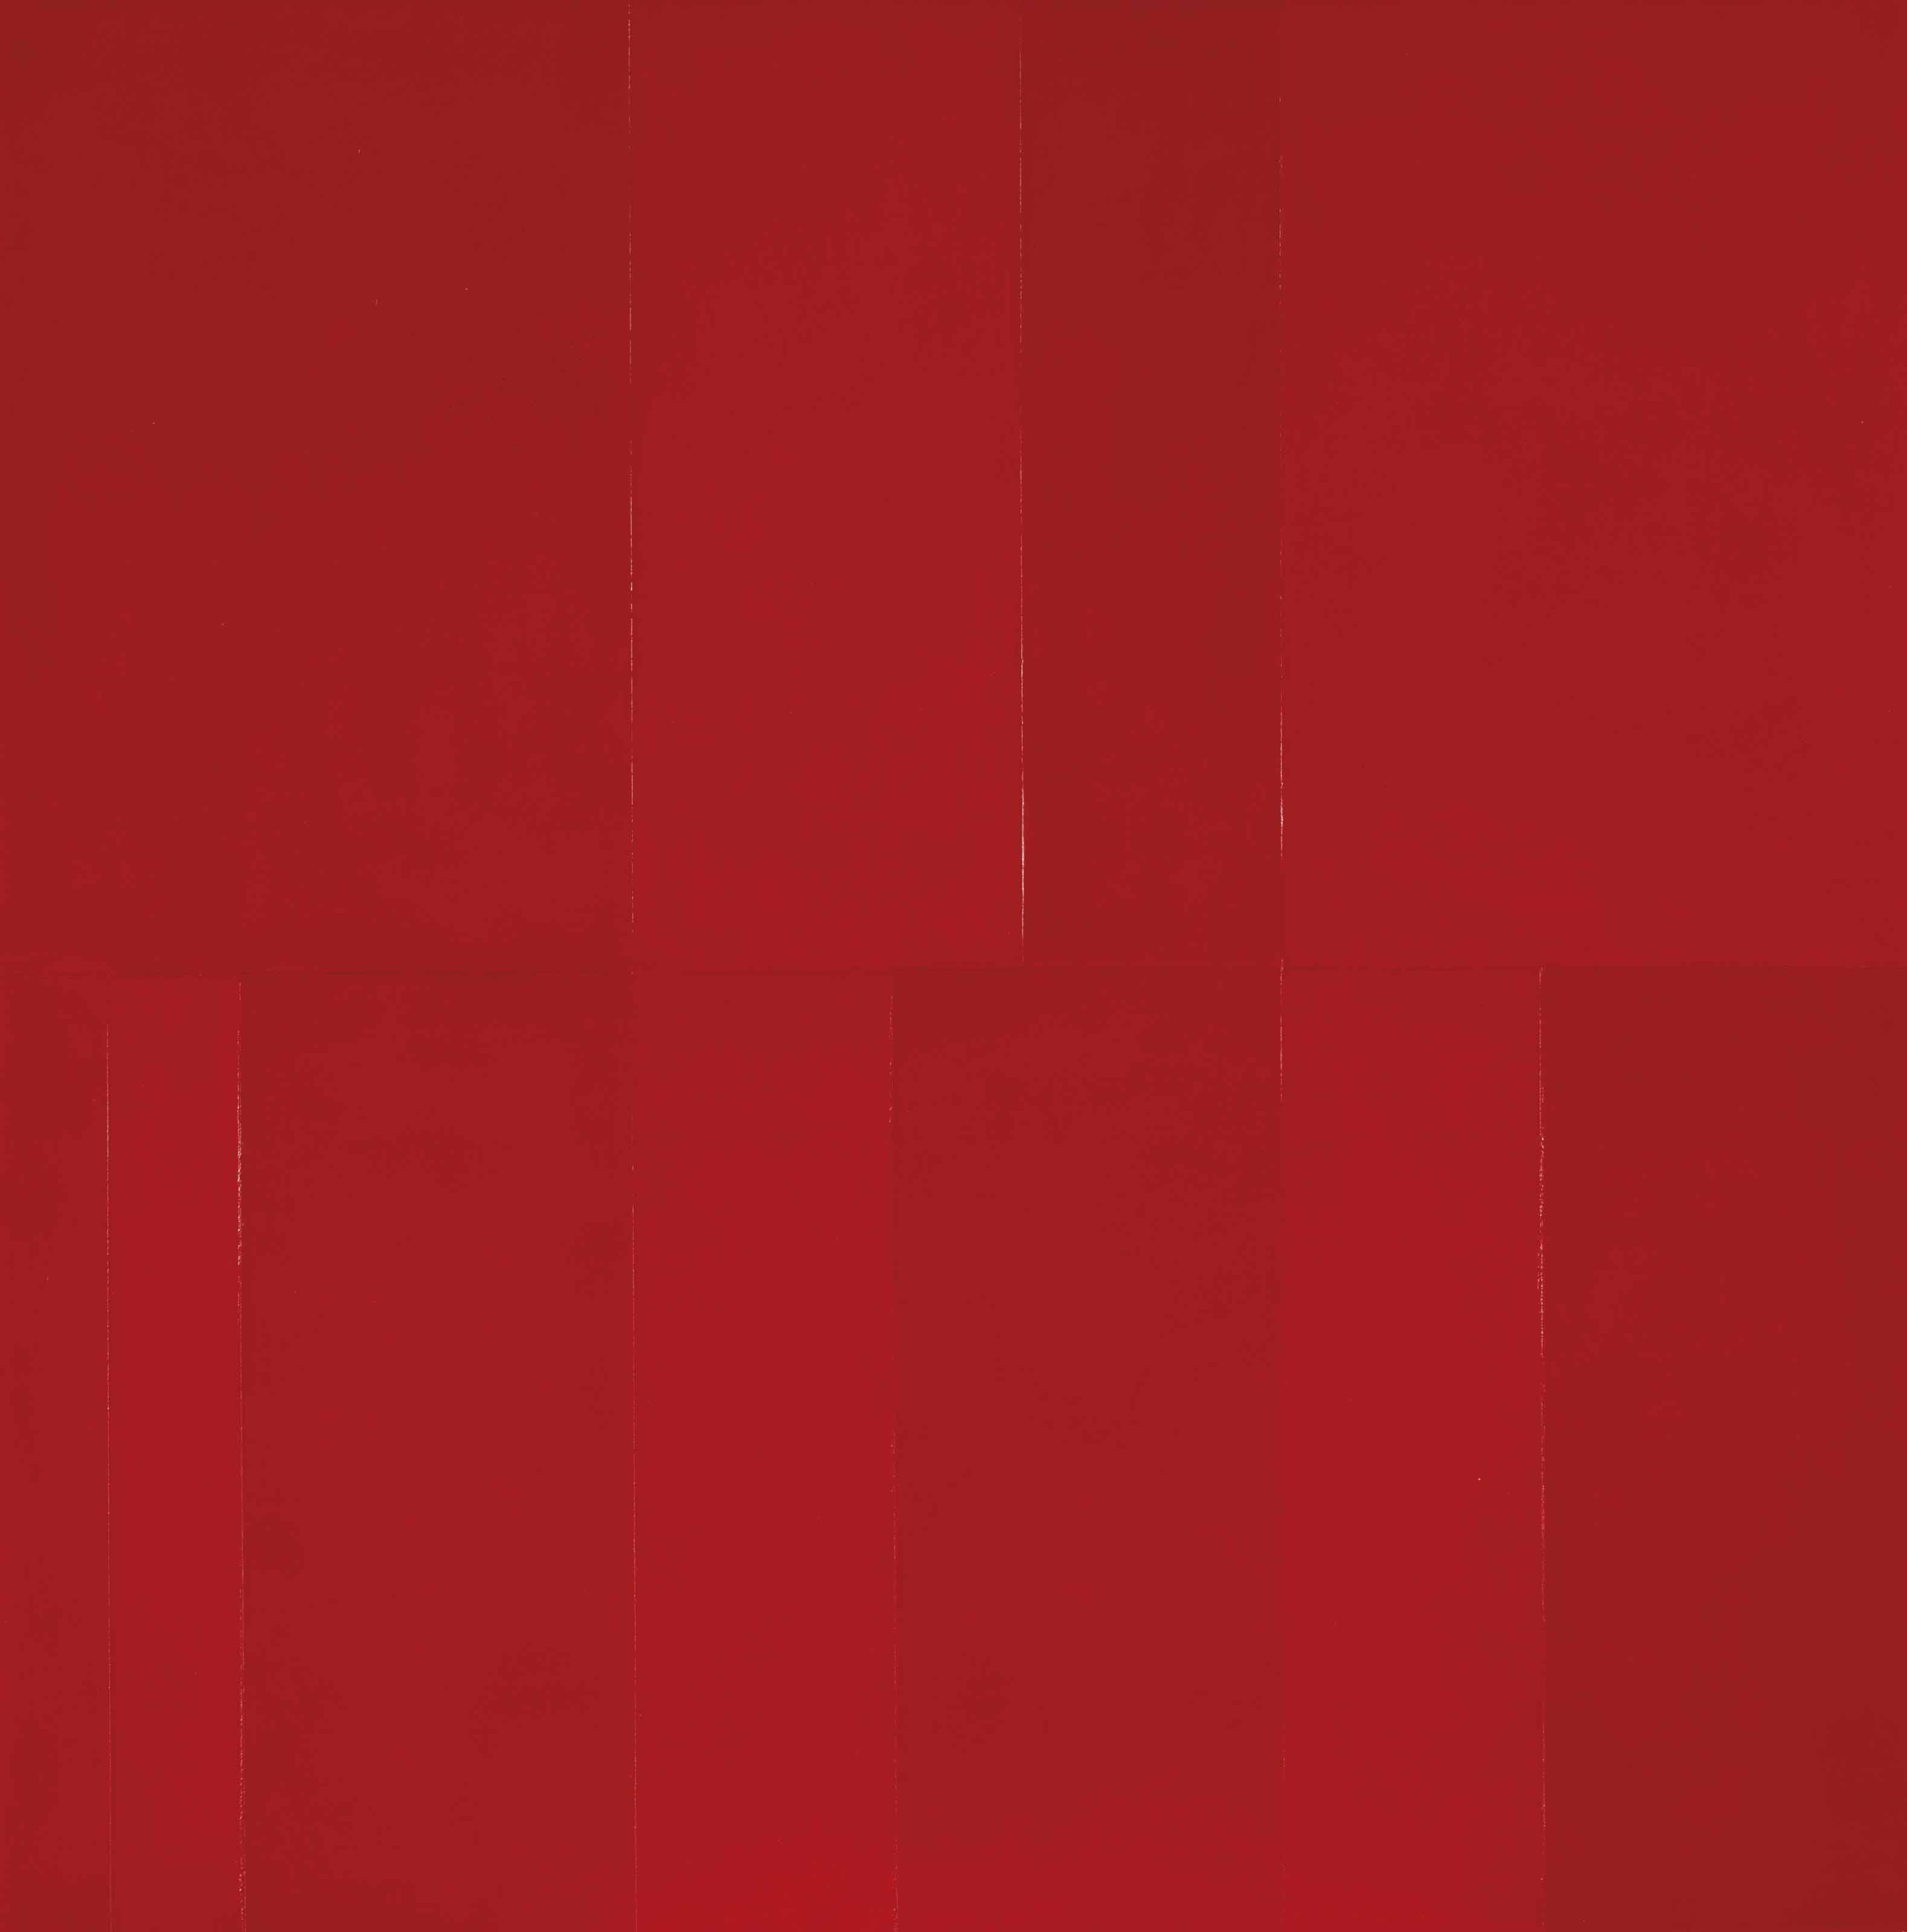 Tableau-Relief Z 778, 1977